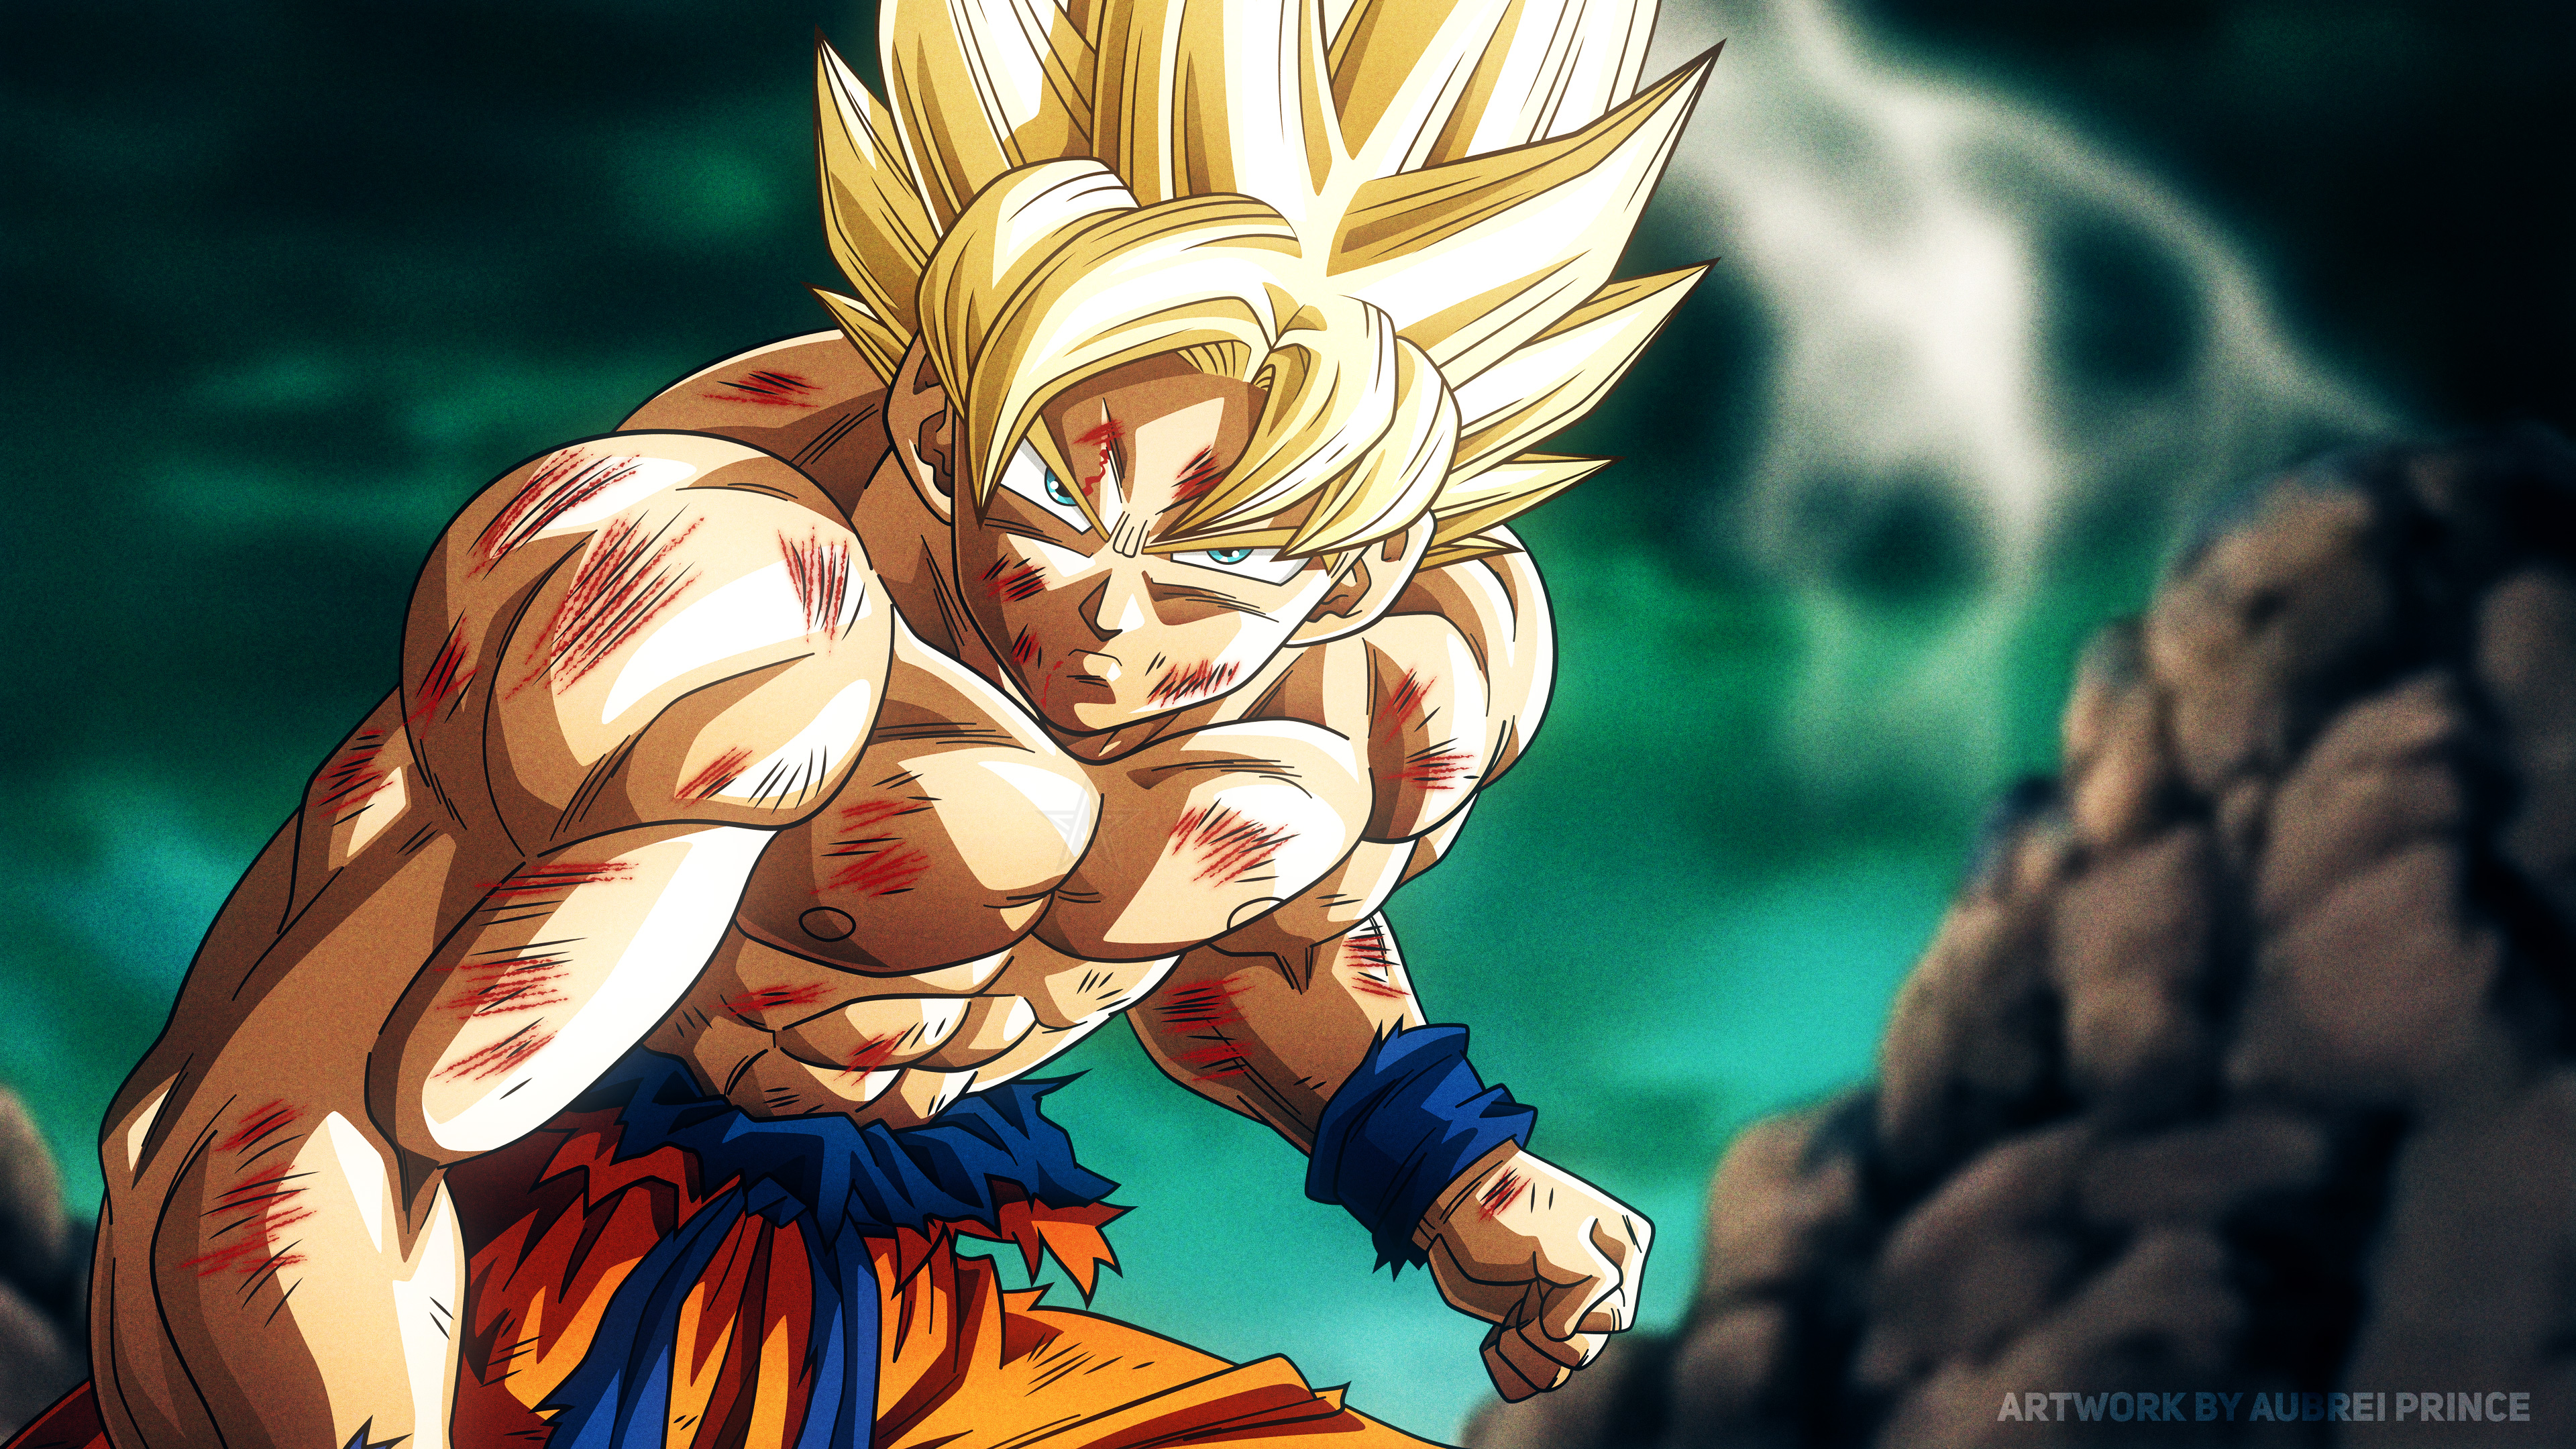 Super Saiyan Son Goku Dragon Ball Z 4k Hd Anime 4k Wallpapers